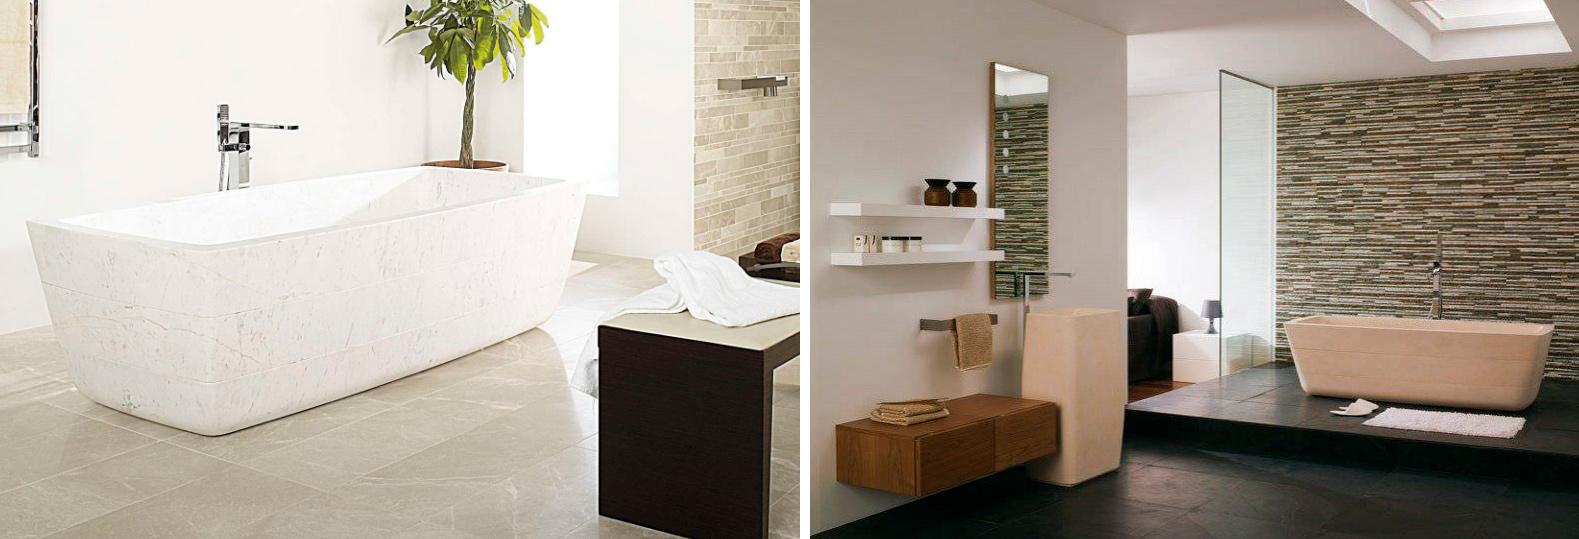 Vasca bagno in pietra